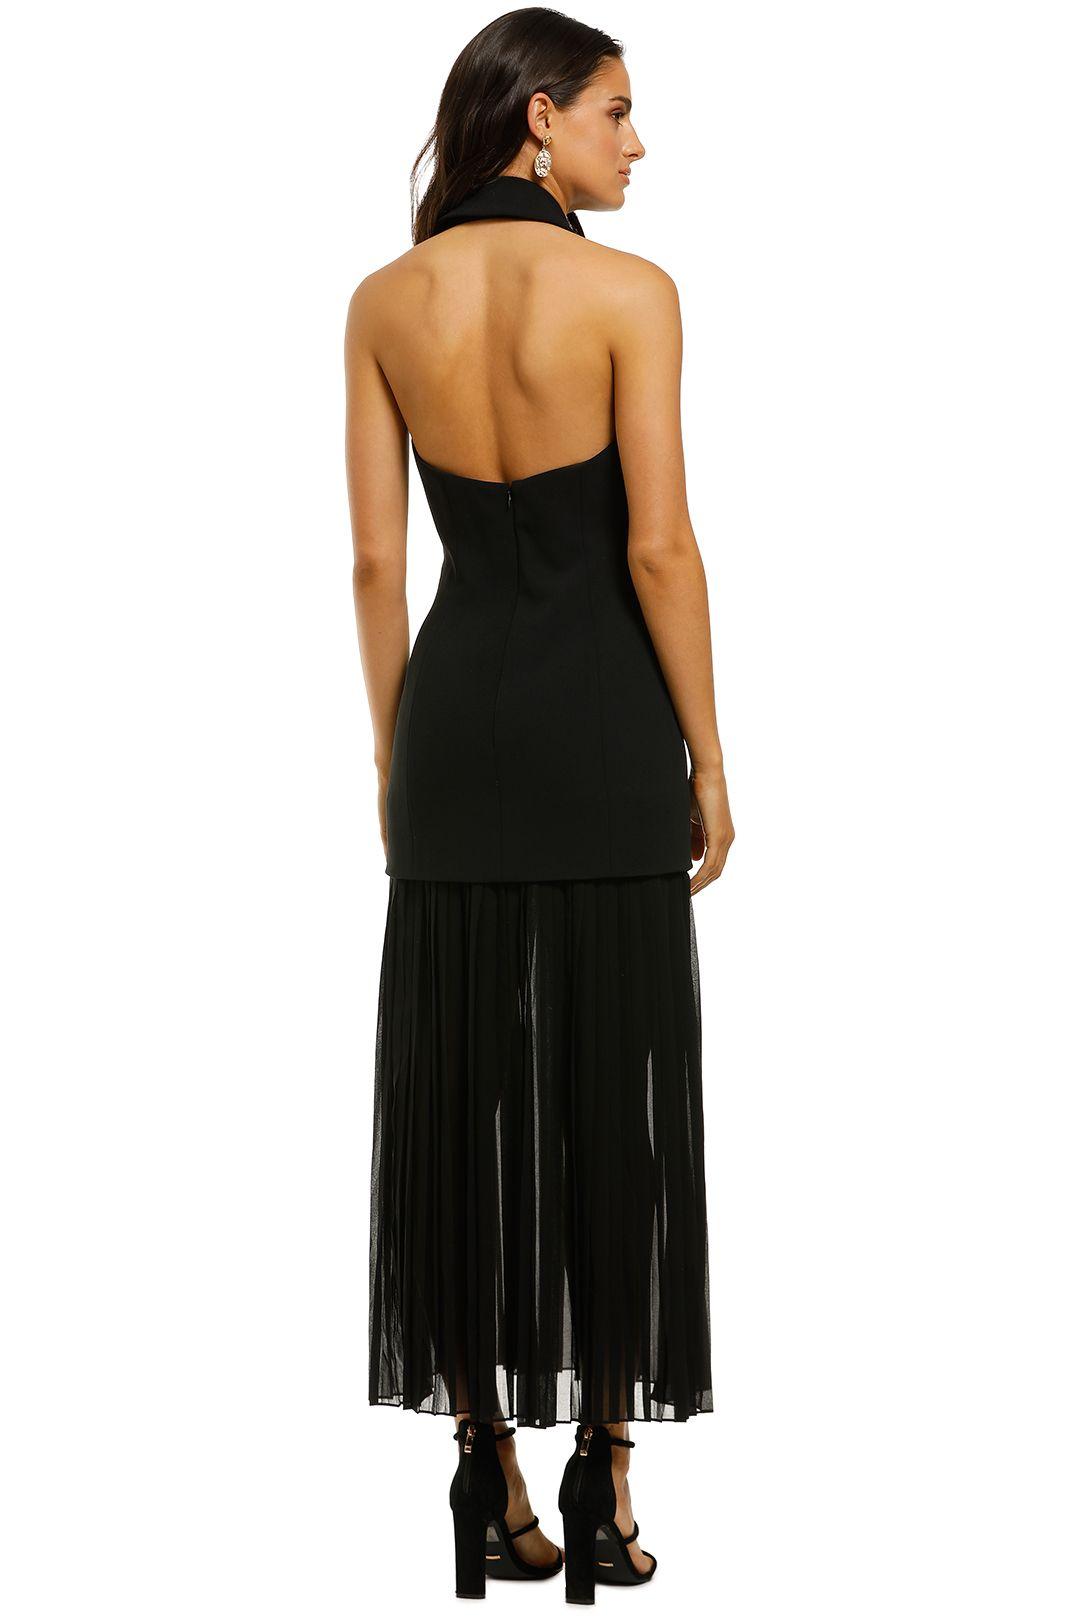 Misha-Collection-Sammiah-Dress-Black-Back